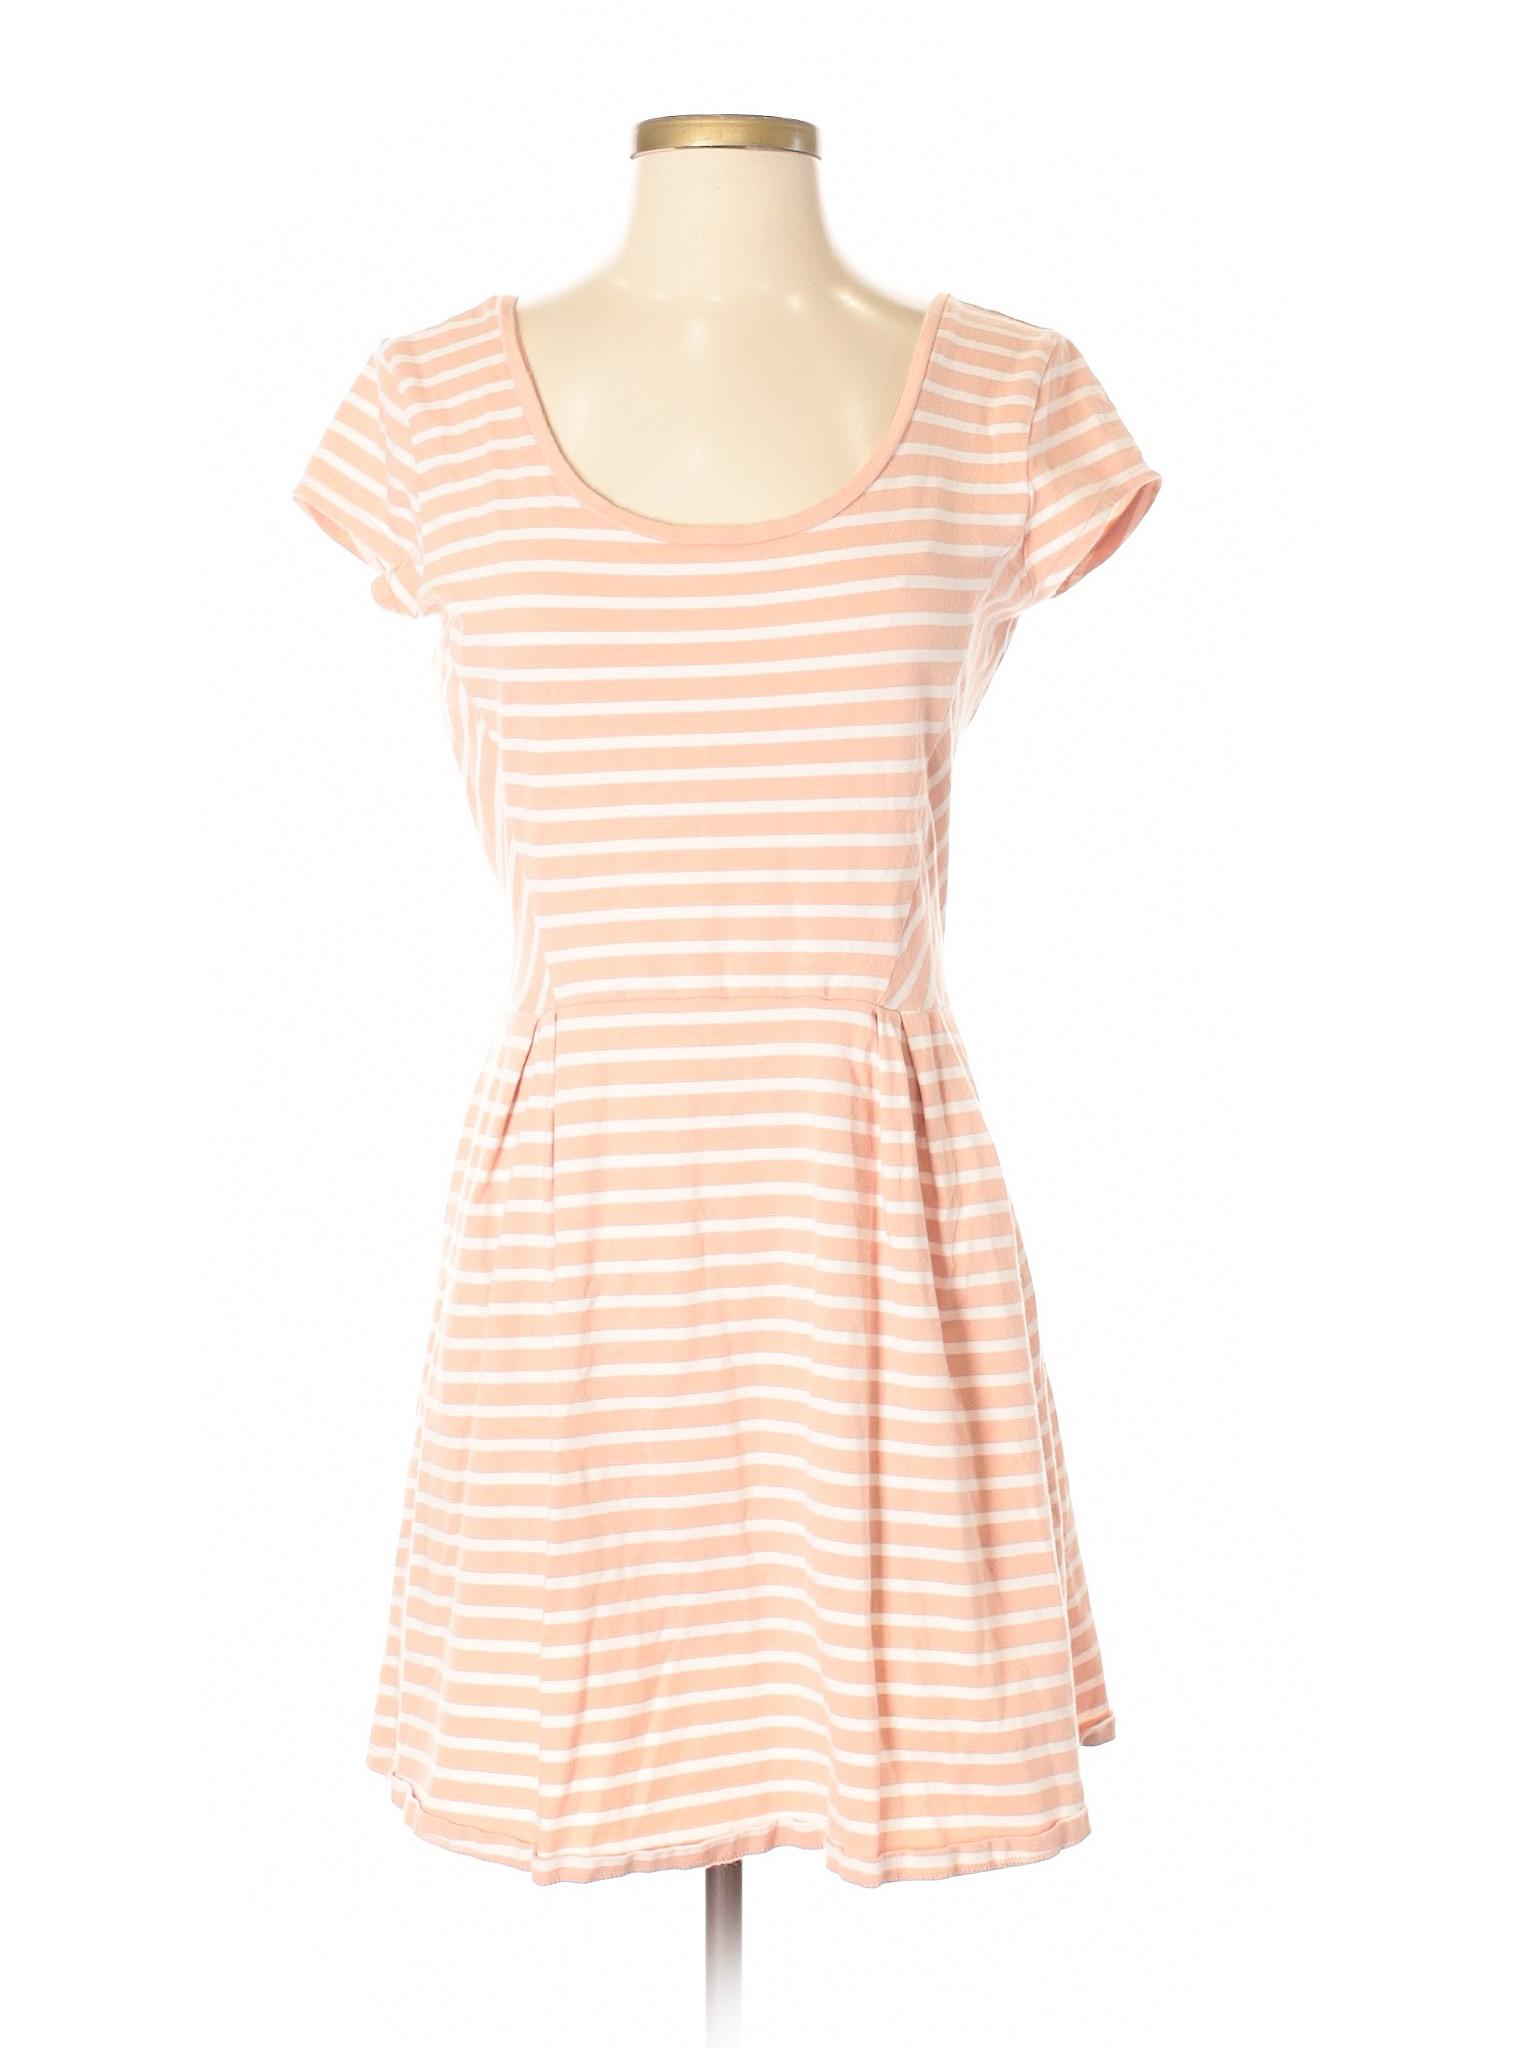 Casual Dress Selling Casual Lauren Lauren Selling Conrad Conrad Selling Conrad Casual Lauren Dress Dress 6qfwFd